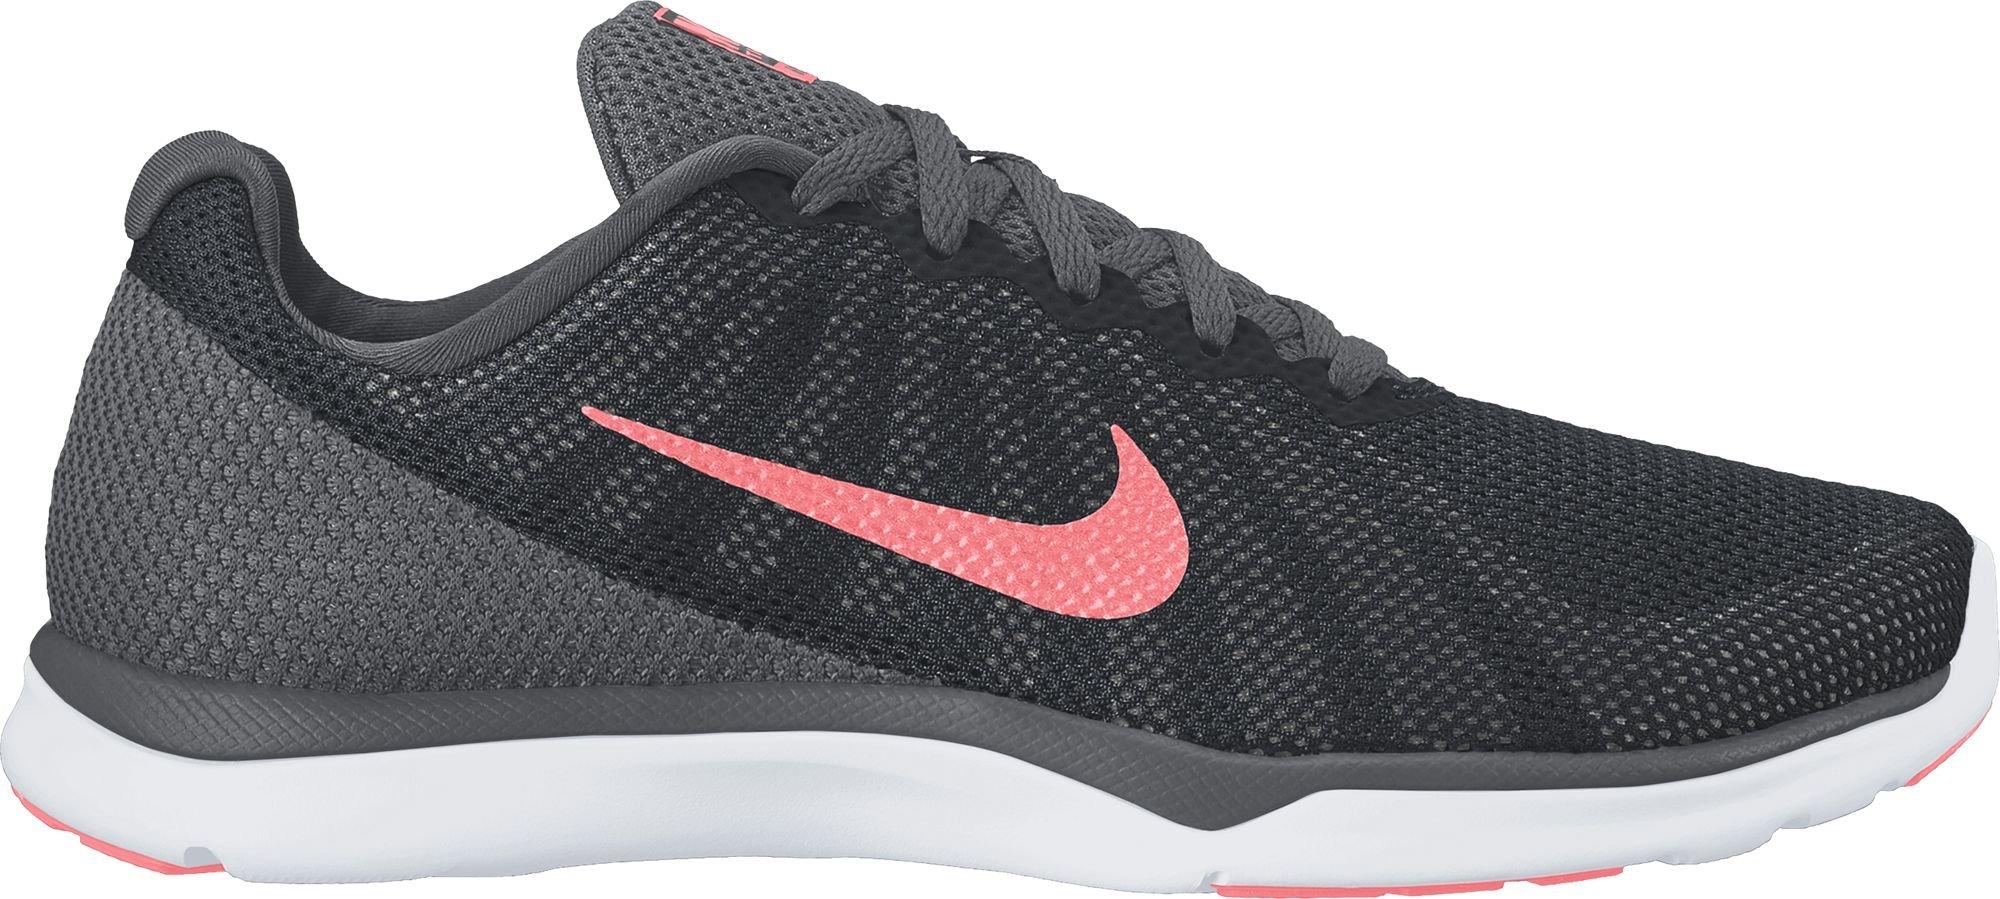 NIKE Women's in-Season TR 6 Cross-Trainer-Shoes, Black/Lava Glow/Dark Grey/White, 9.5 B US